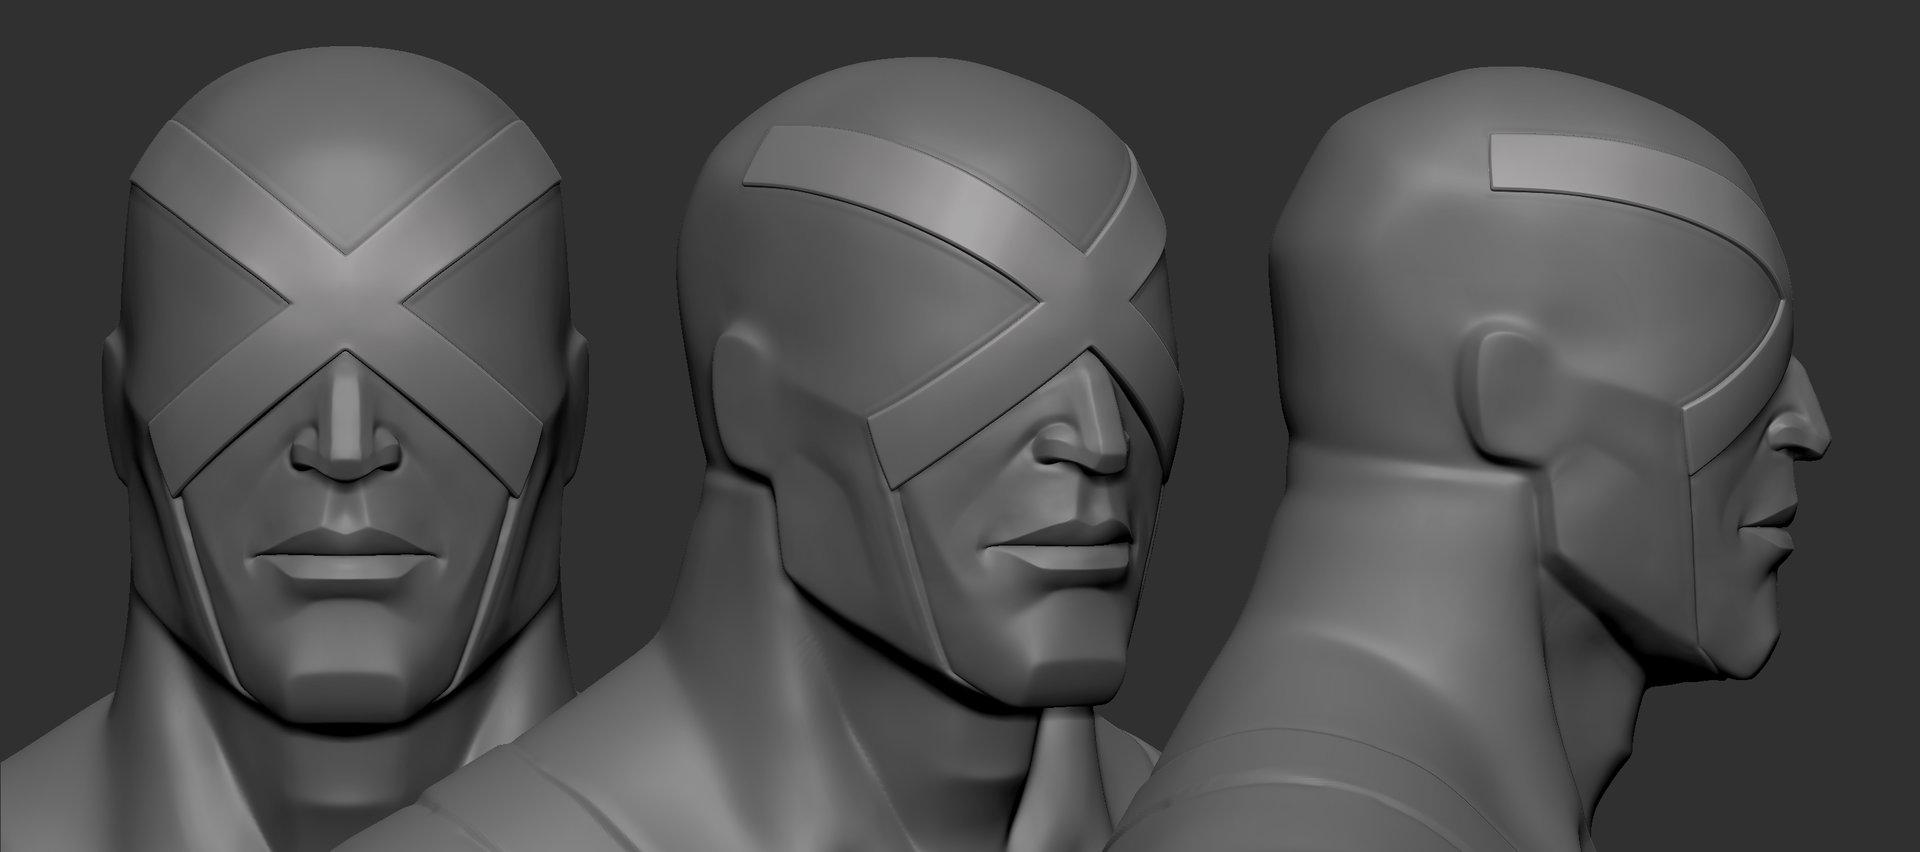 Robert fink xfacecyclops turnaround face